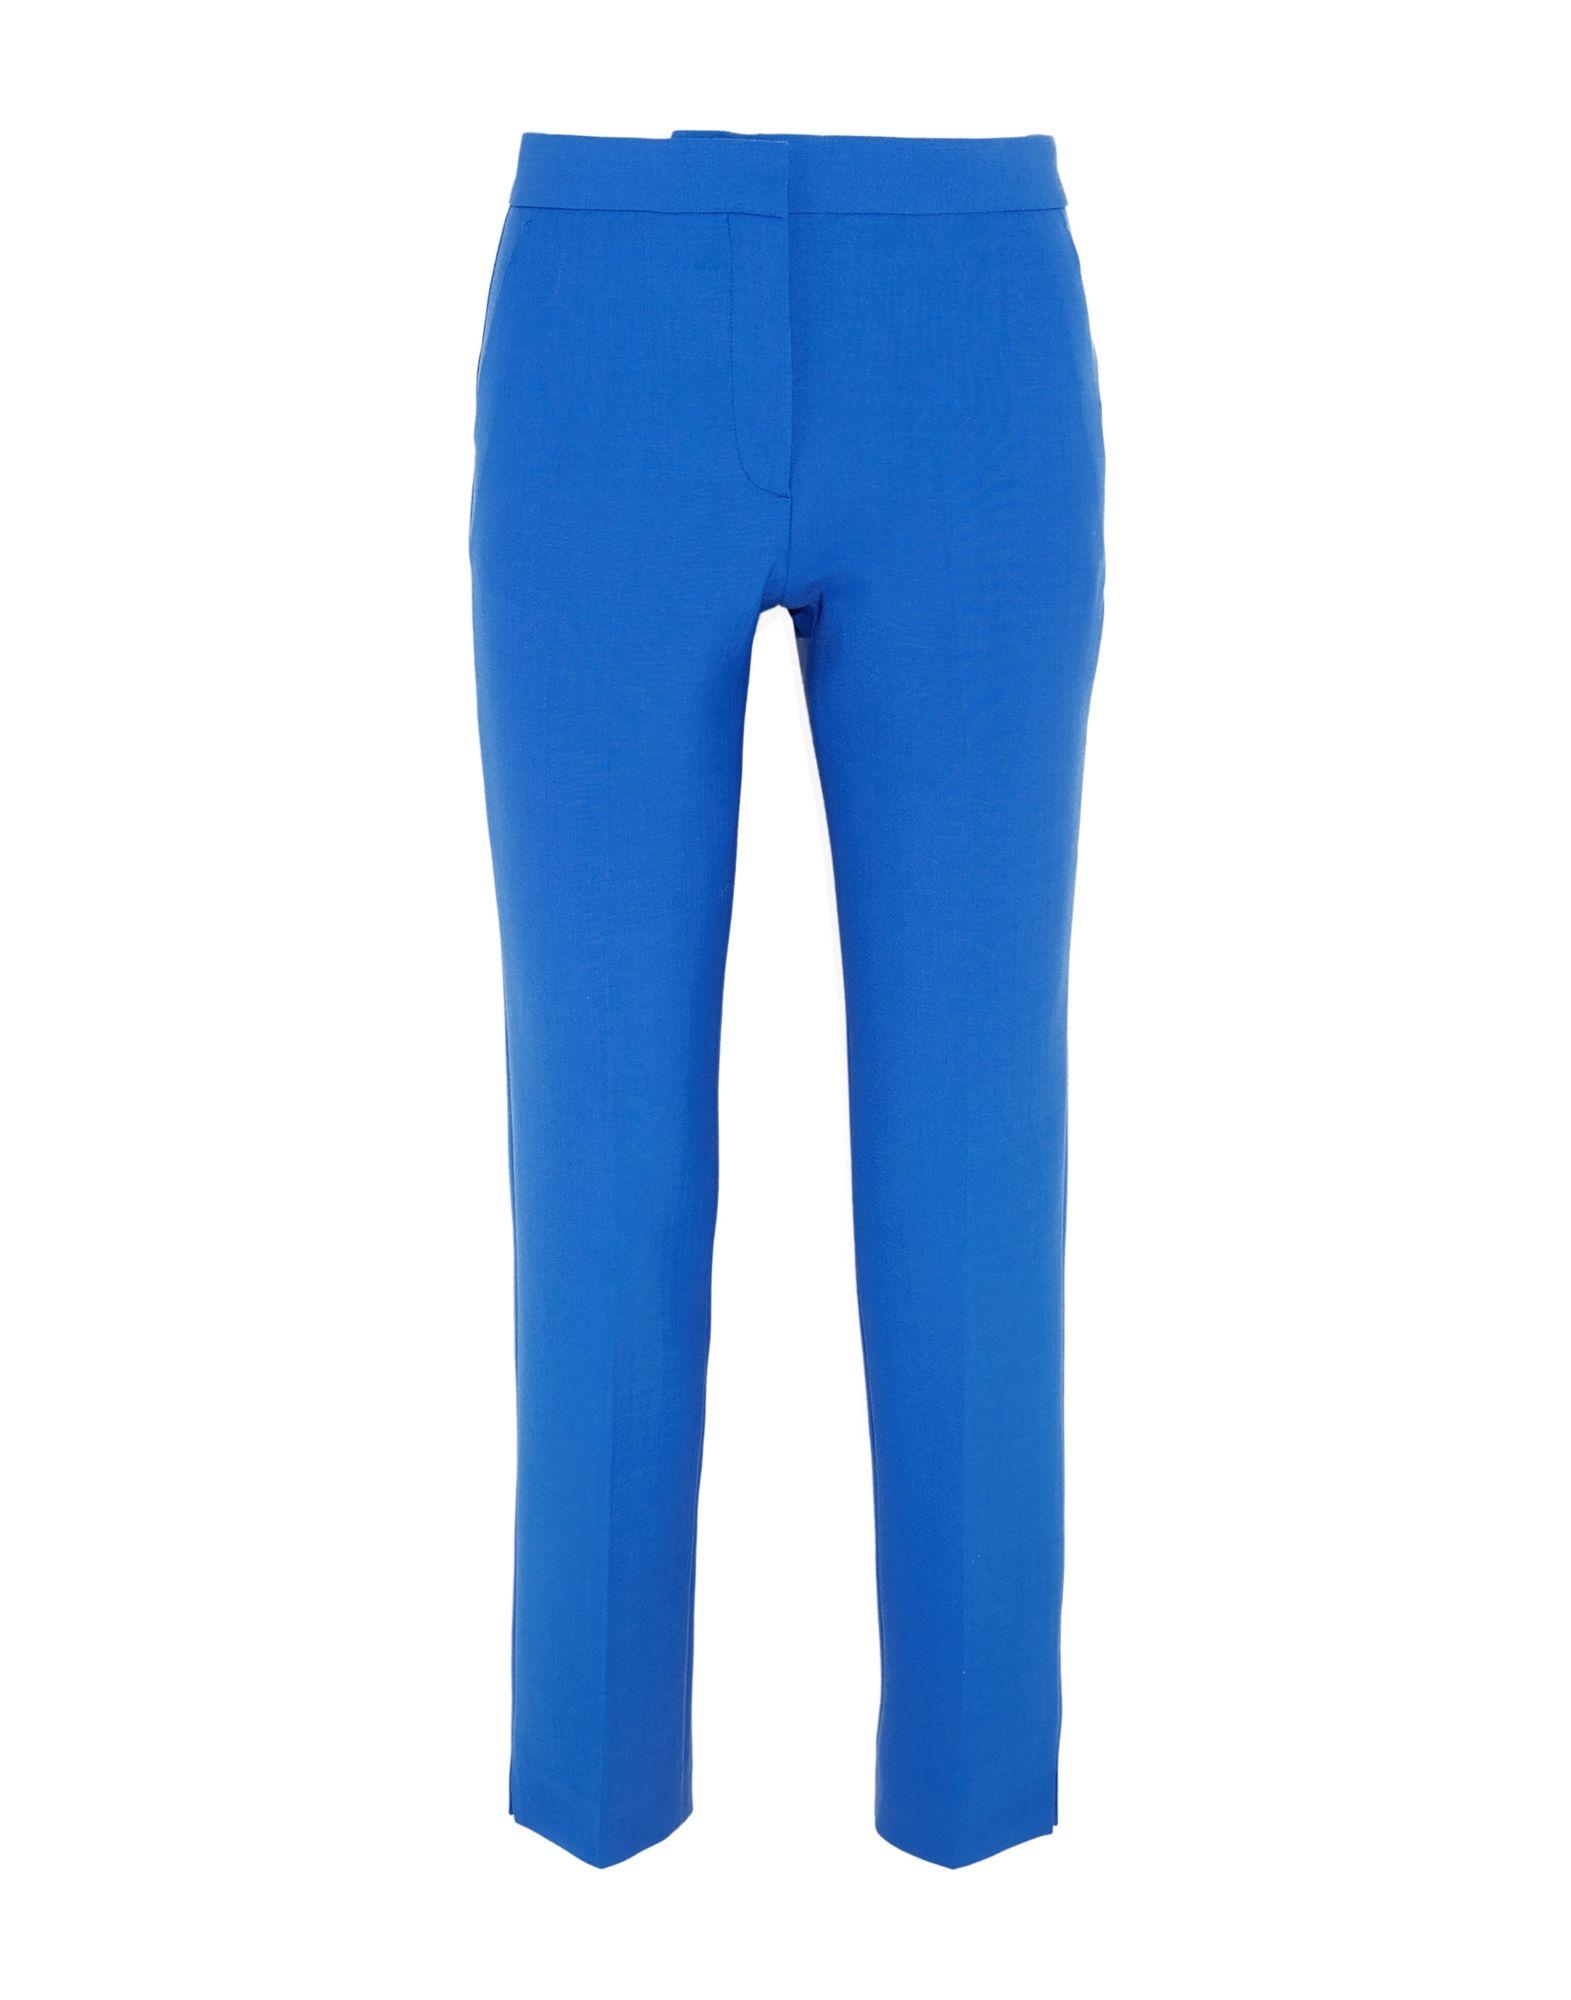 Pantalone Victoria, Victoria Beckham damen - 13283979CB